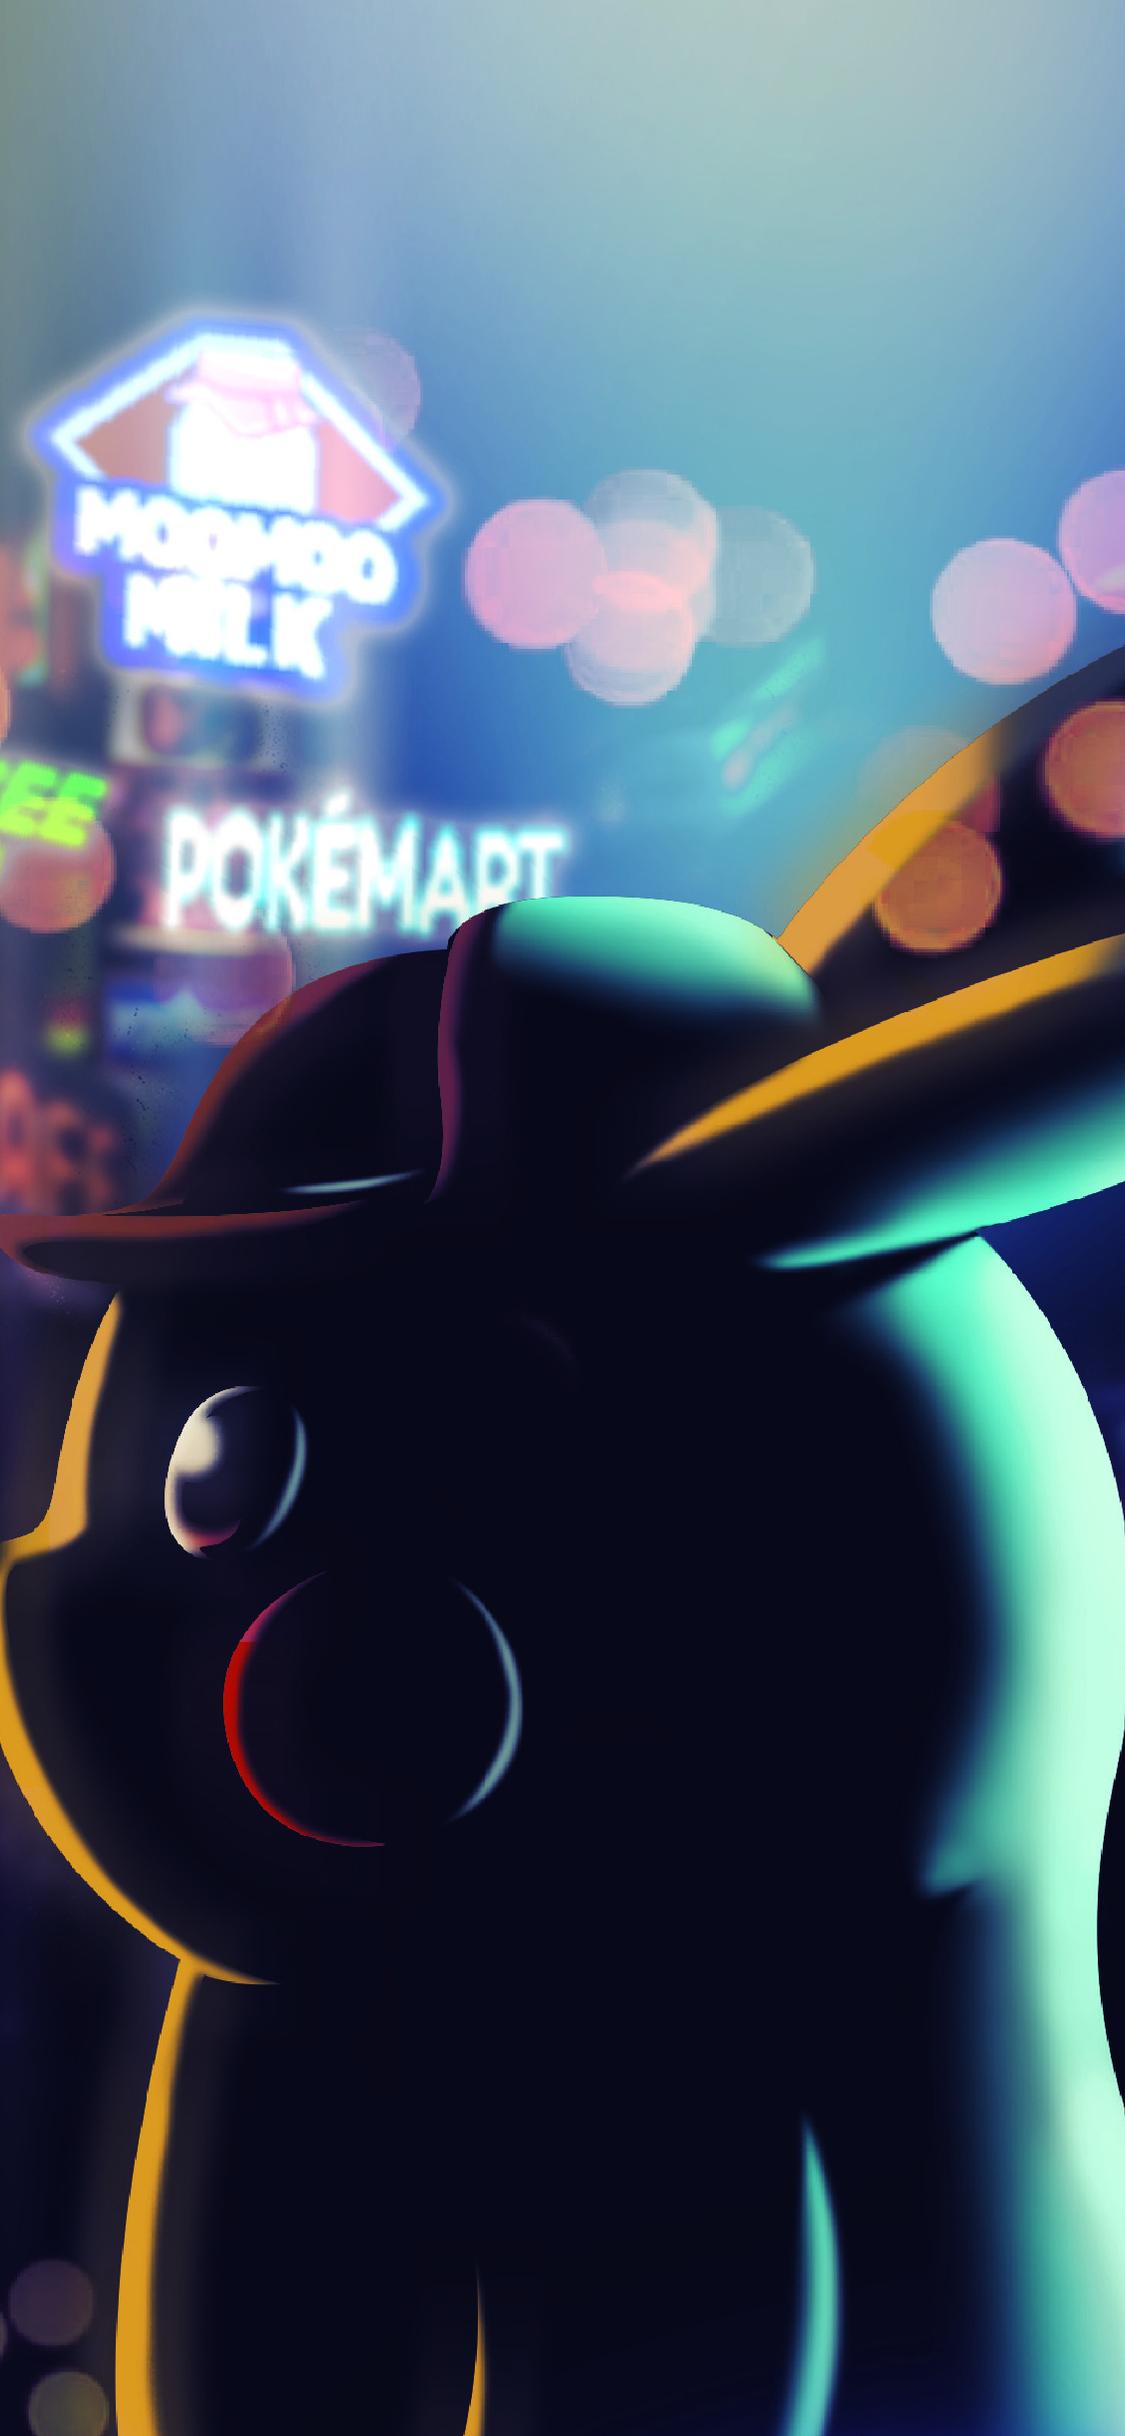 1125x2436 Pokemon Detective Pikachu Iphone Xs Iphone 10